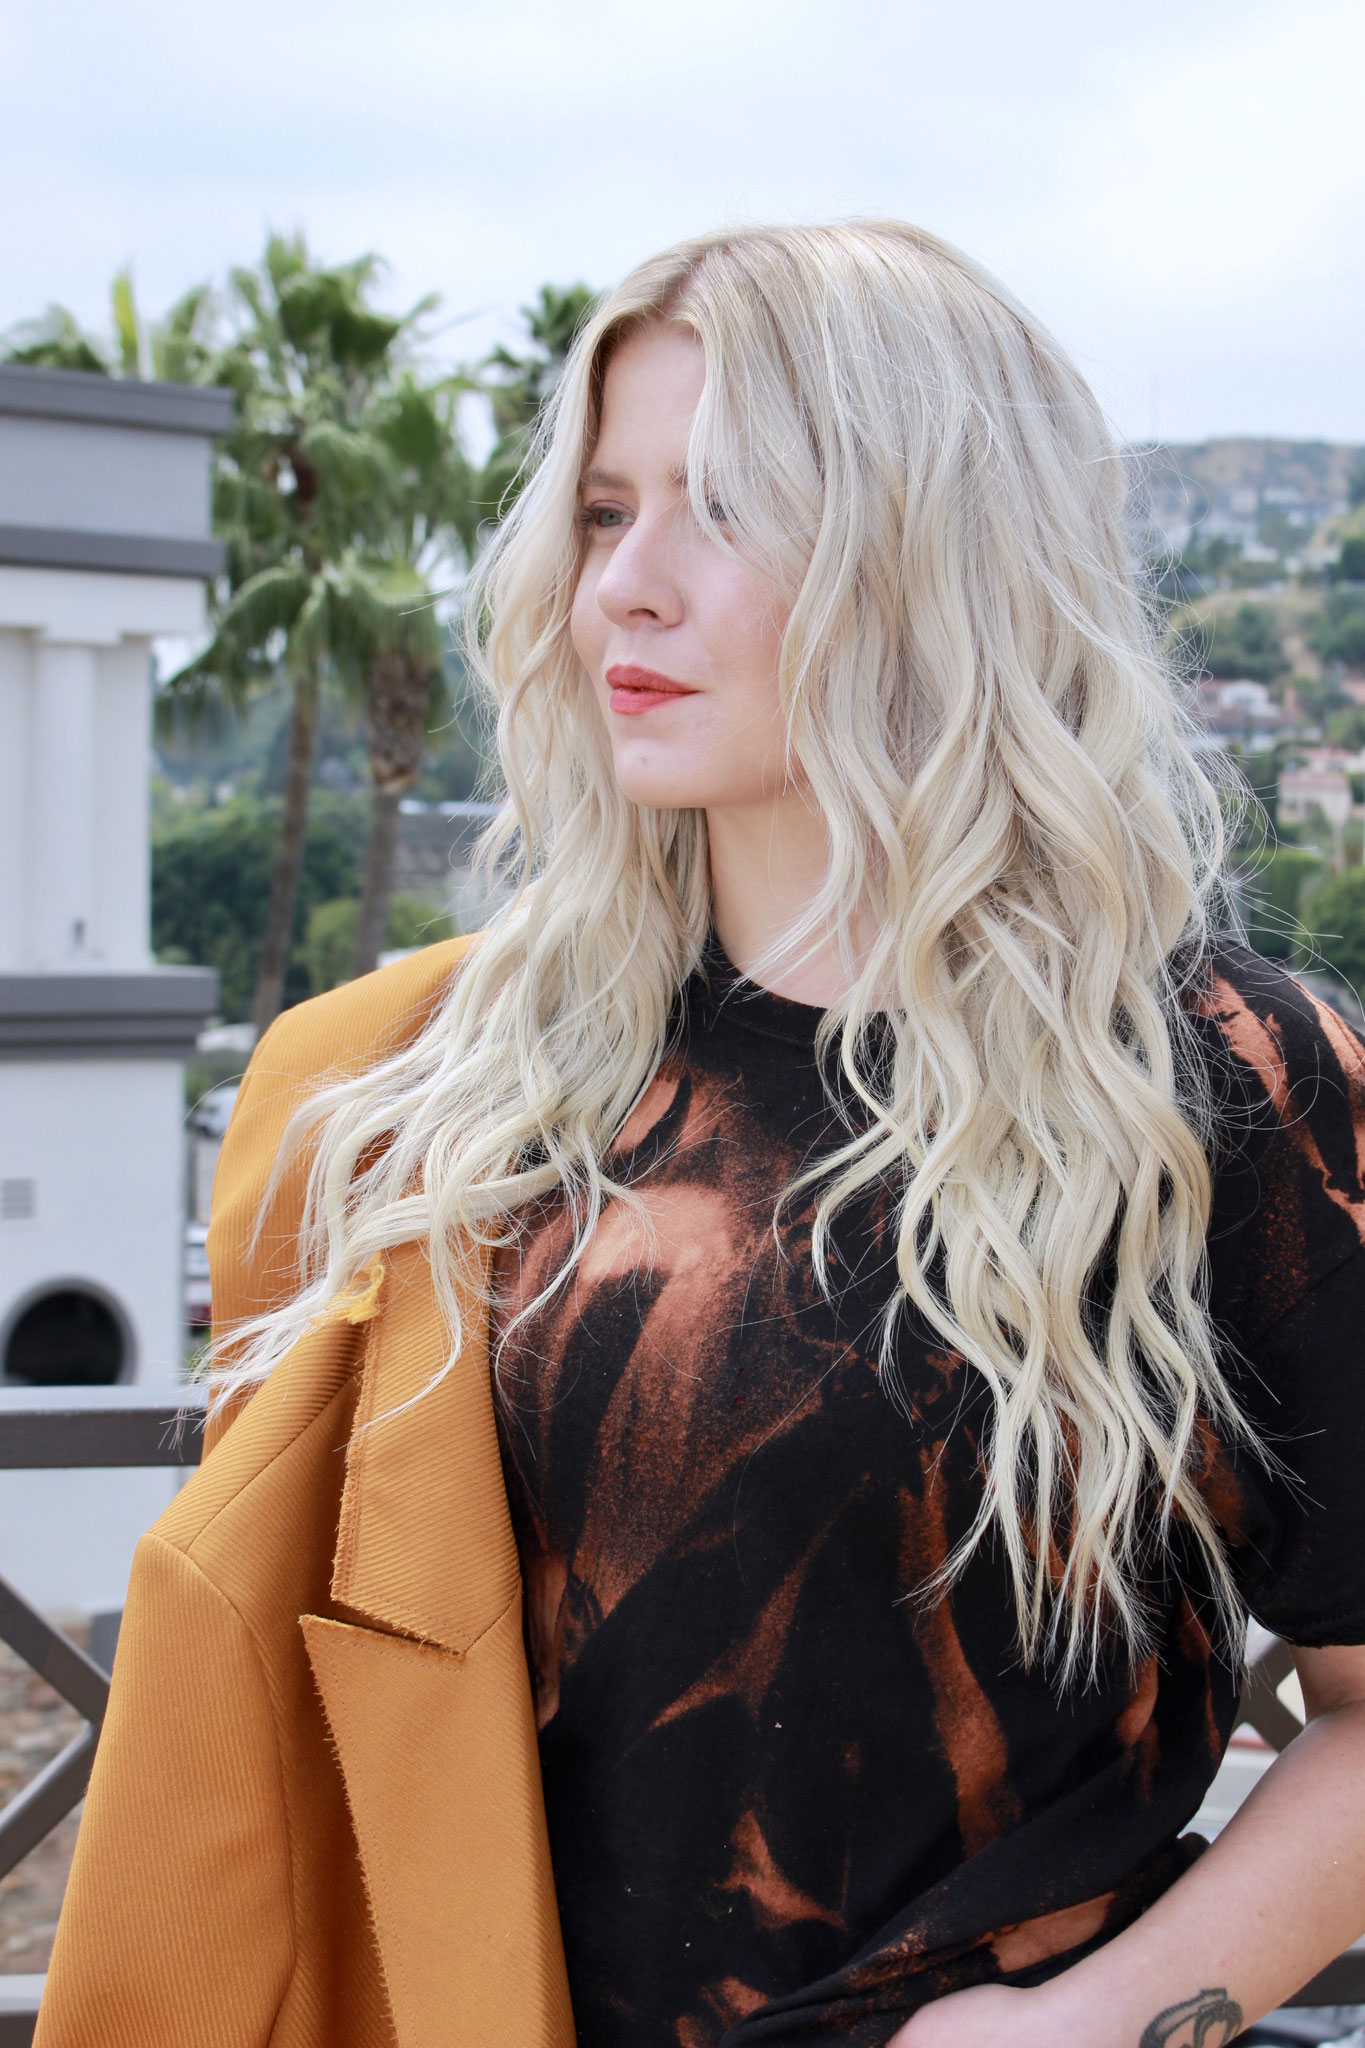 Anastasia K Salon Handtied Hair Extensions Natural Beaded Rows Balayage Temecula West Hollywood Blonde Specialist In Temecula Ca Blonde Specialist In West Hollywood Ca Handtied Hair Extensions